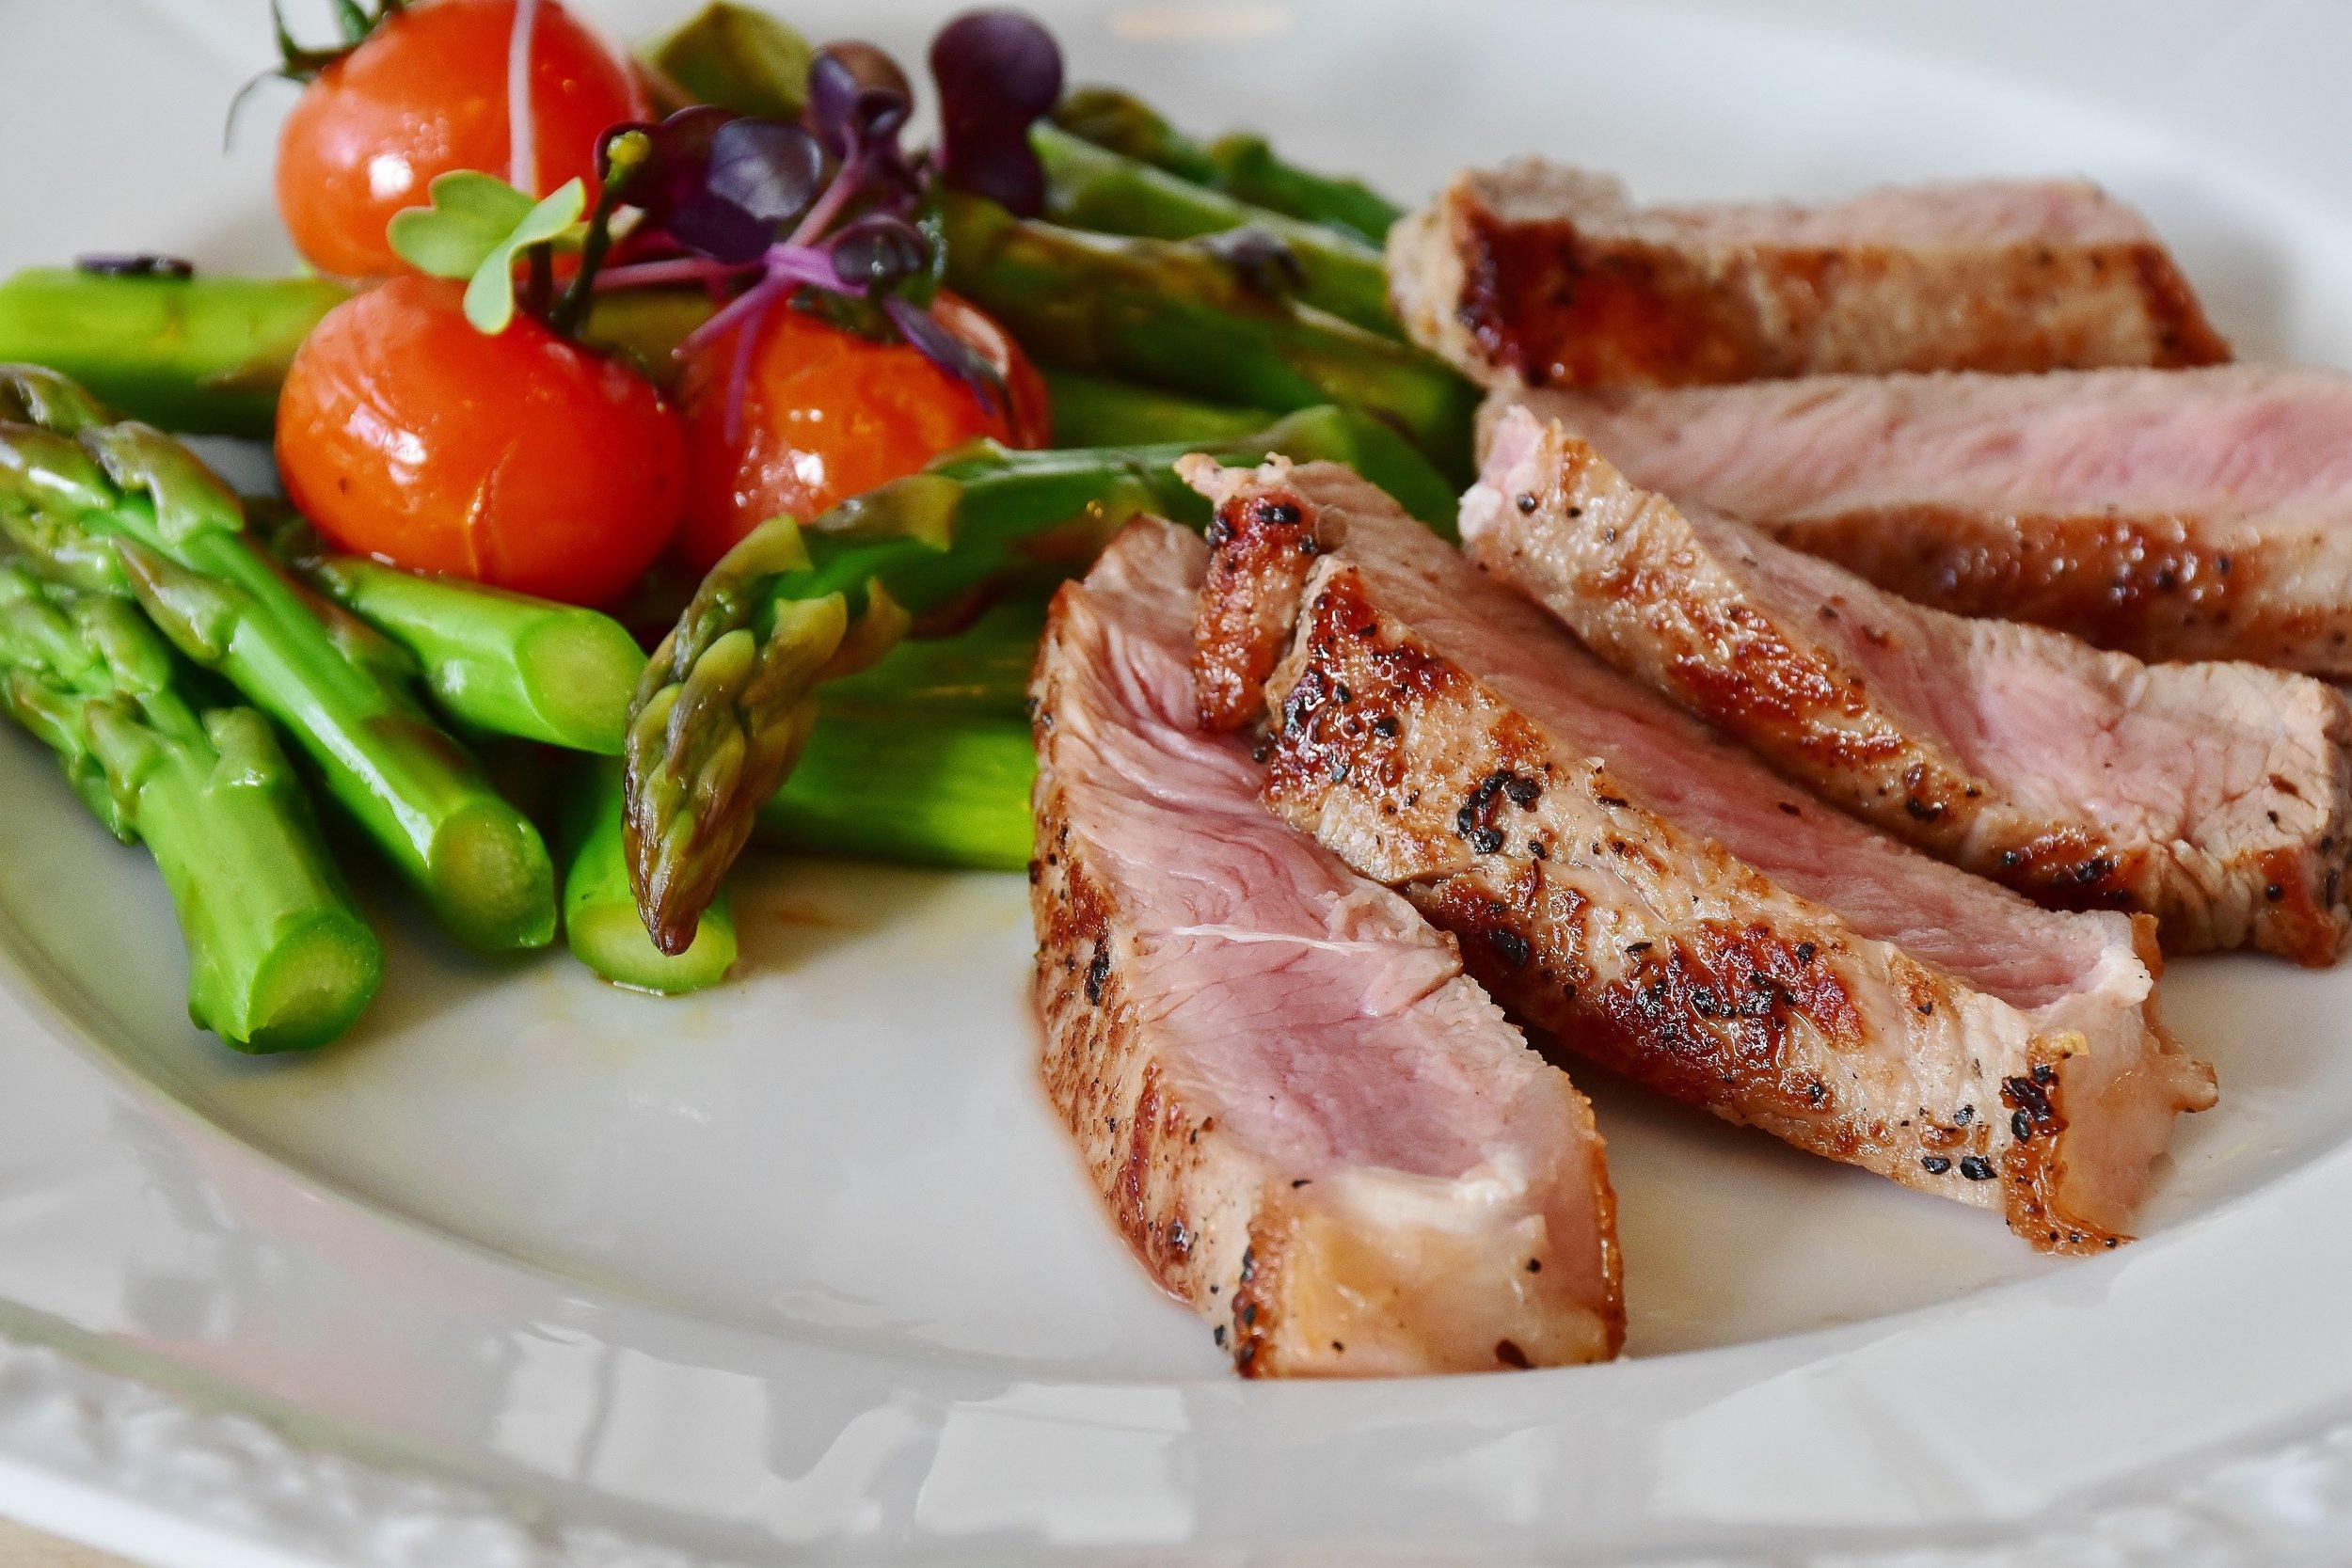 asparagus-barbecue-cuisine-361184.jpg